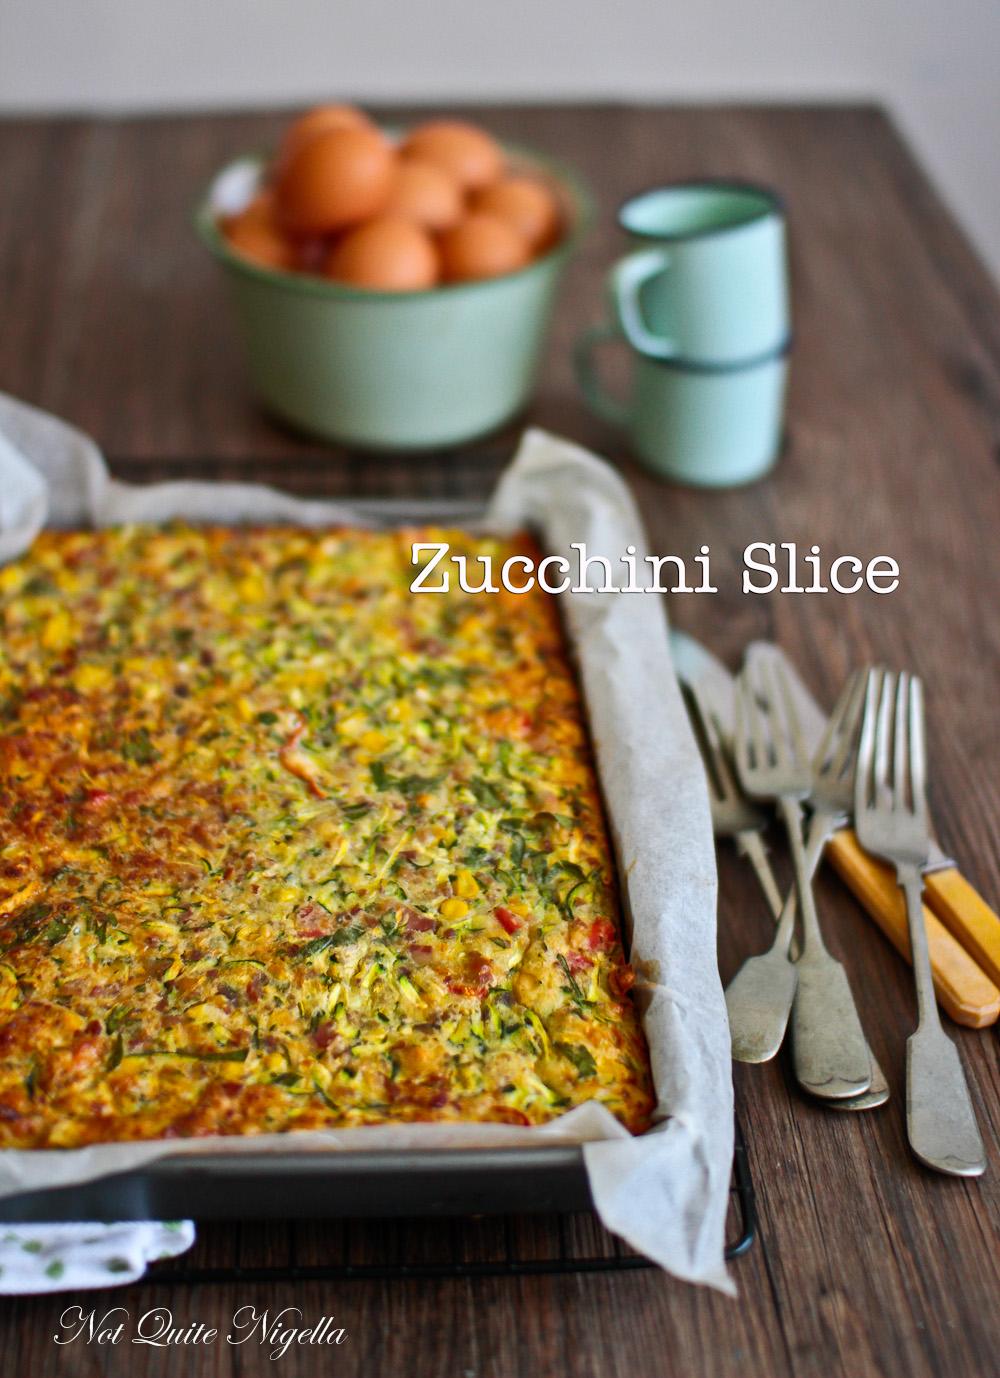 Zucchini Slice Not Quite Nigella